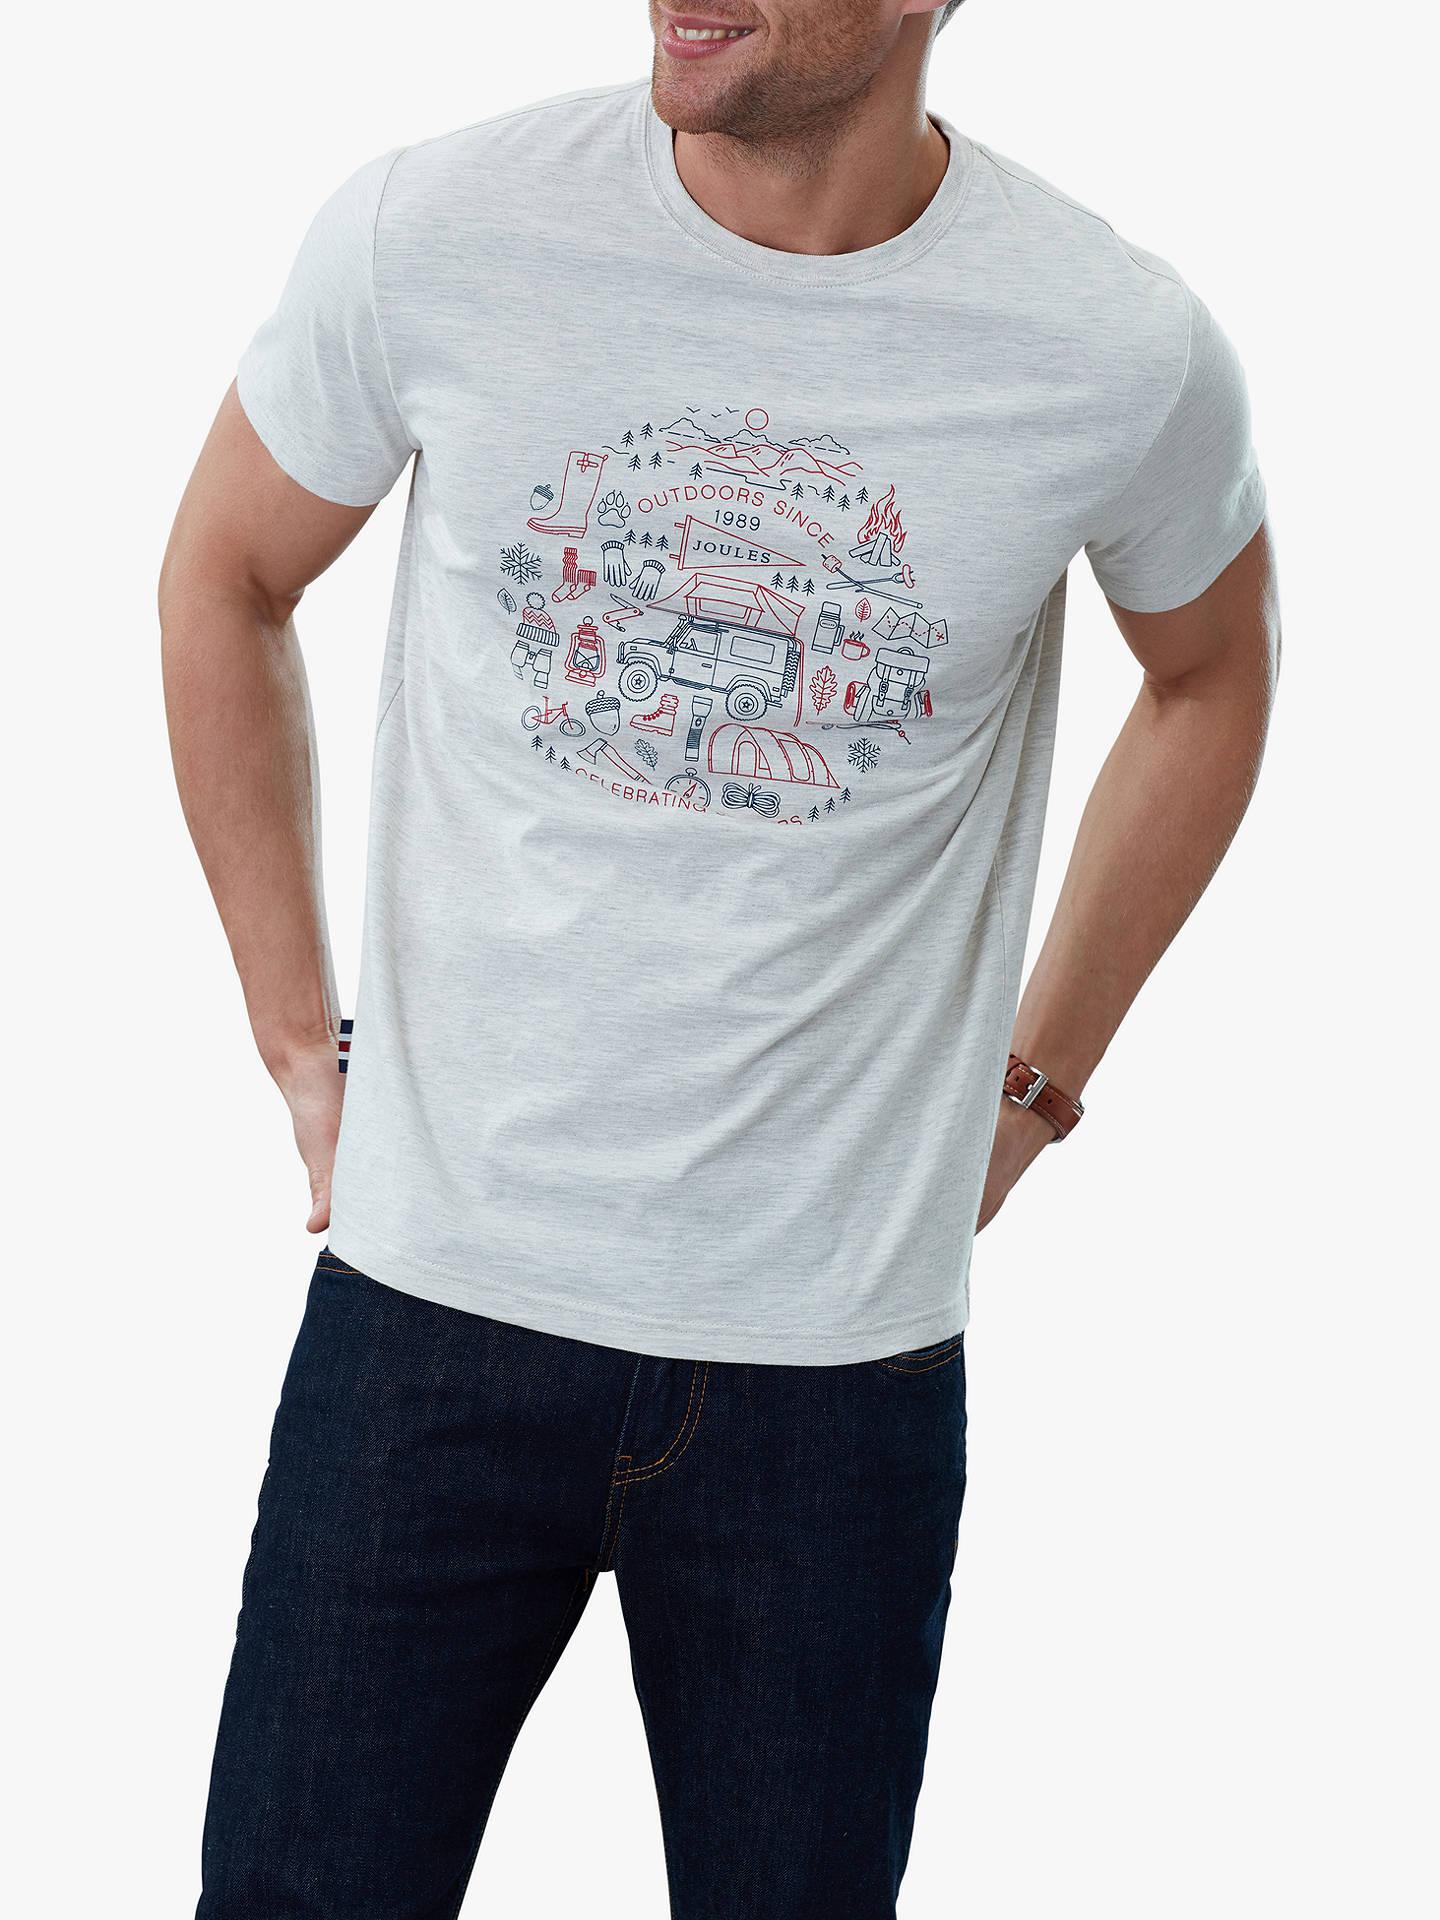 3706c69ede2c Buy Joules Flynn Graphic Short Sleeve Cotton T-Shirt, Antique Cream, S  Online ...